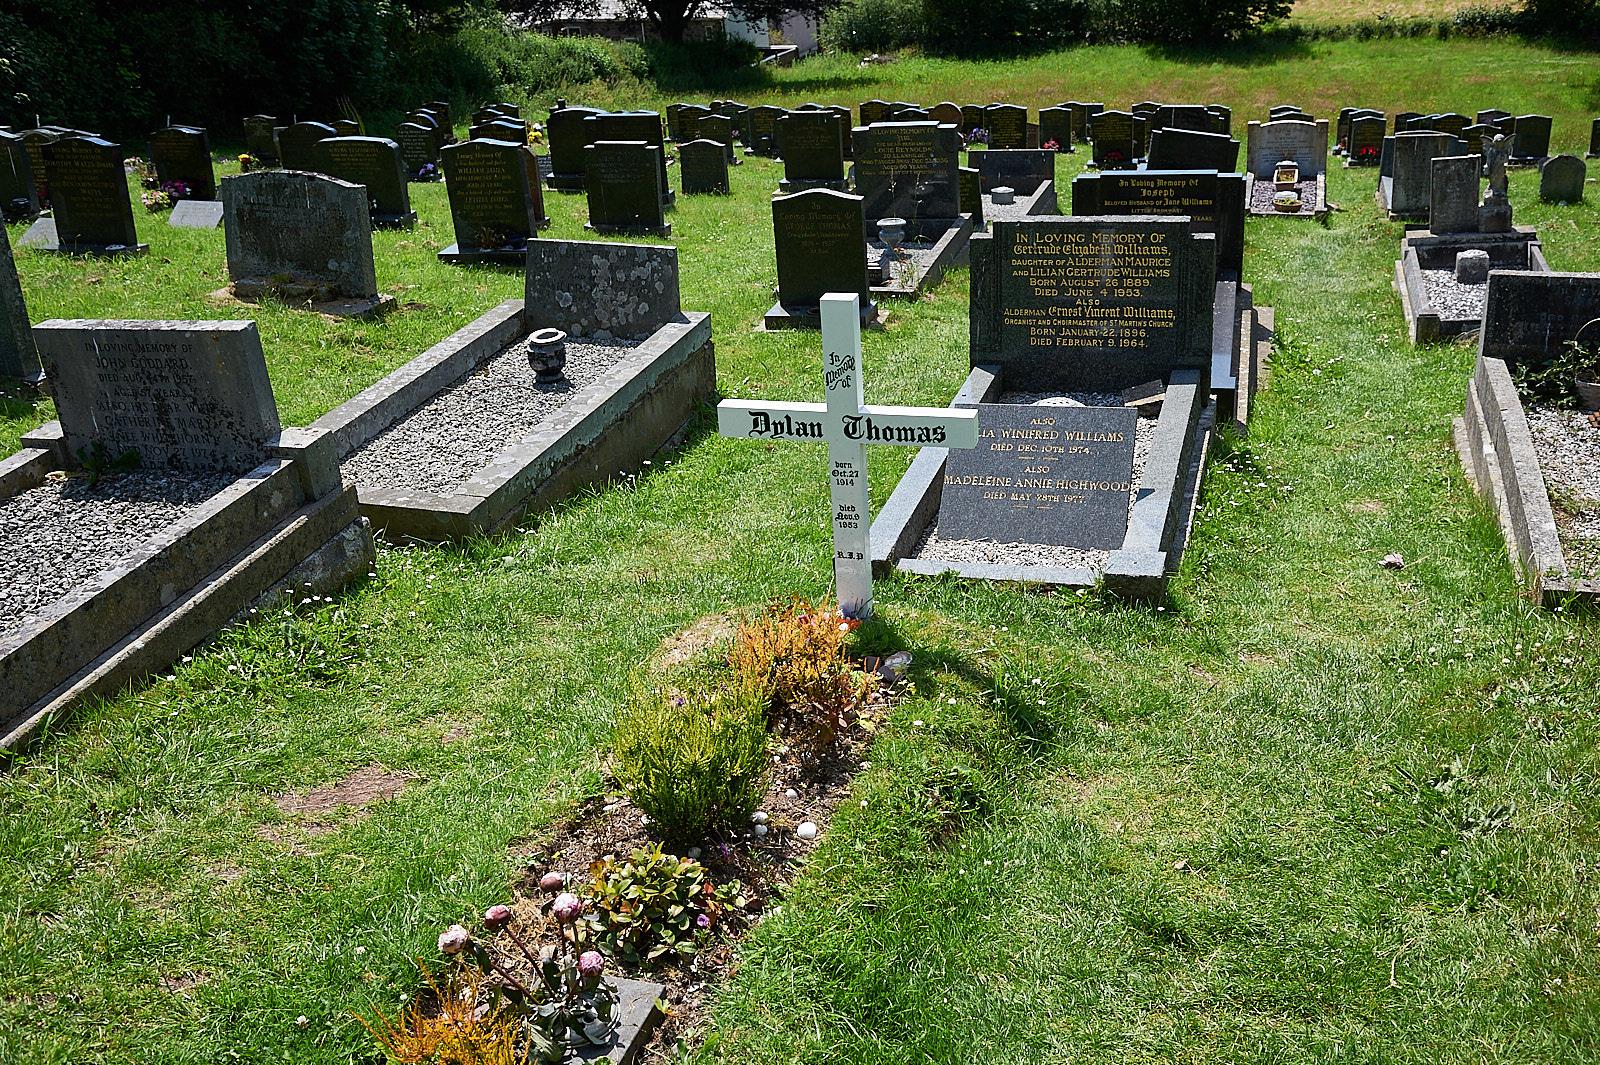 dylan thomas grave